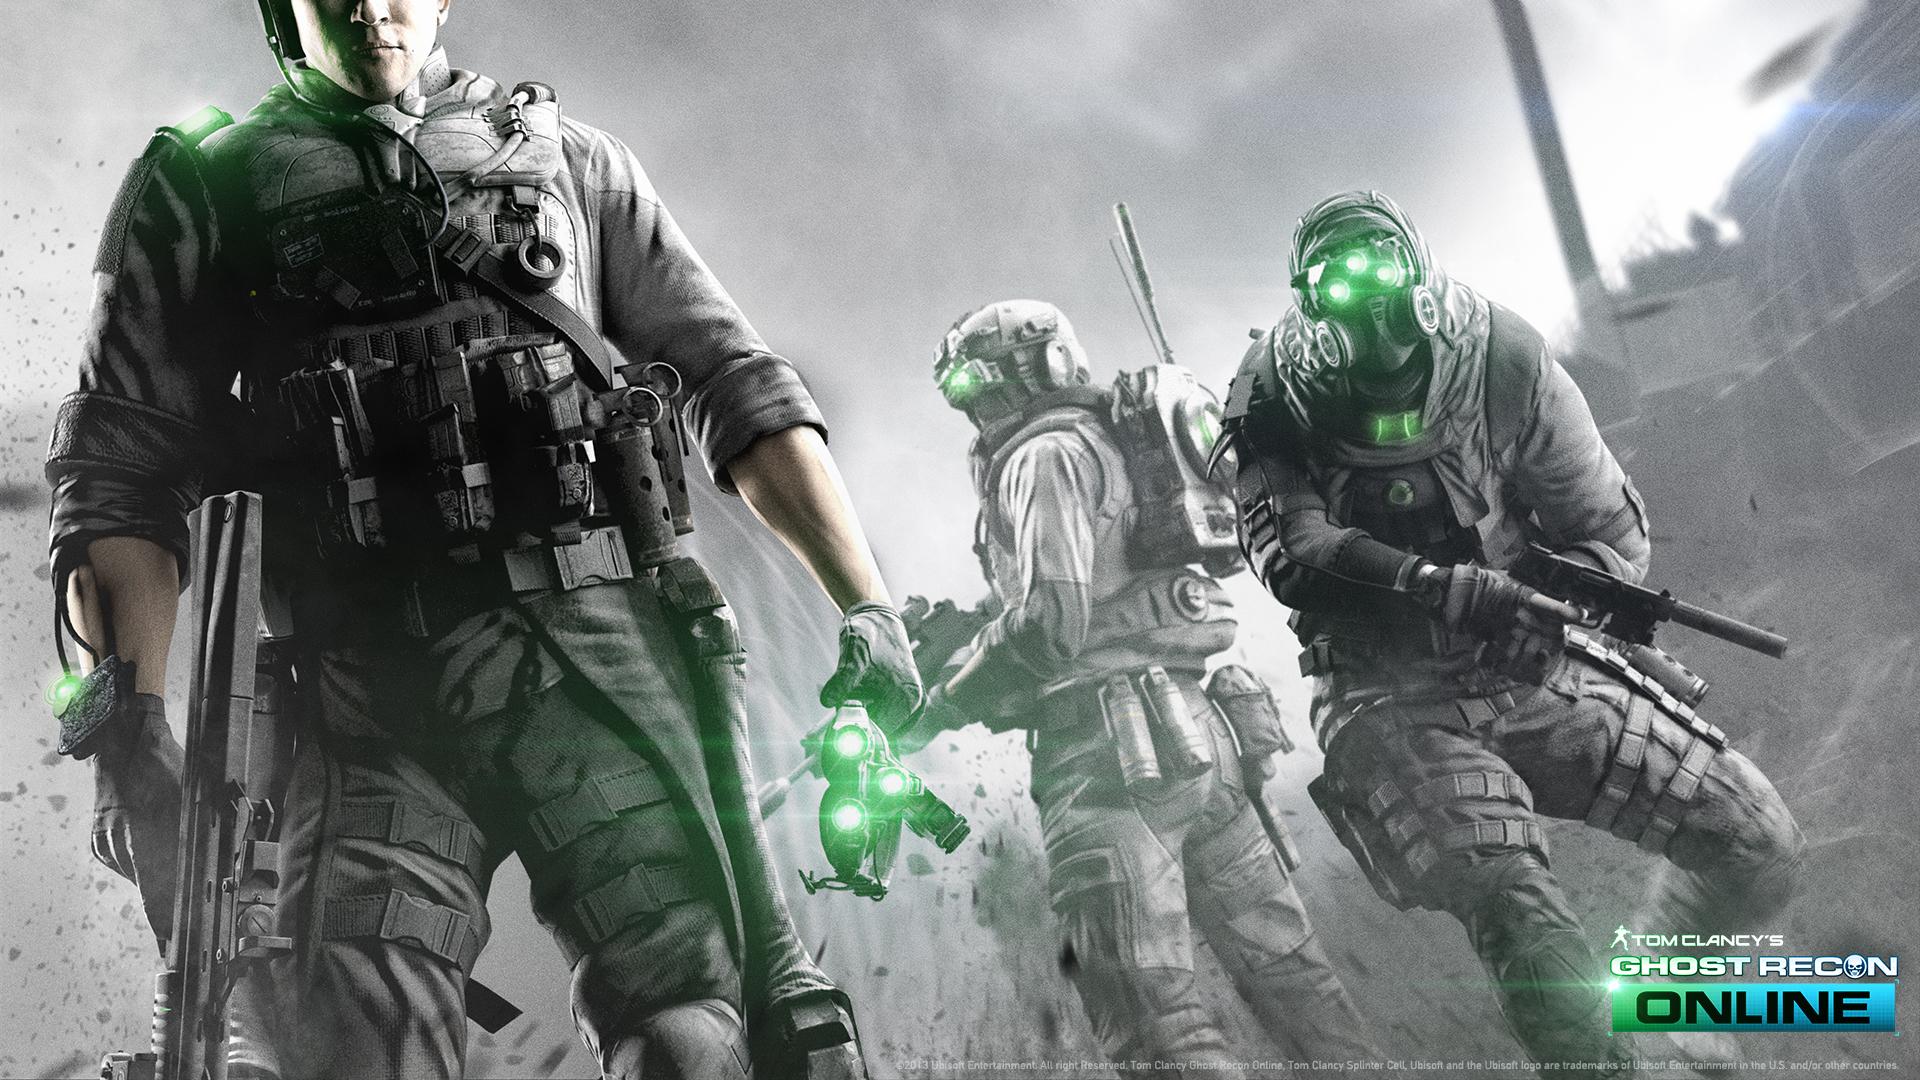 ghost recon warrior online gas mask scifi f wallpaper